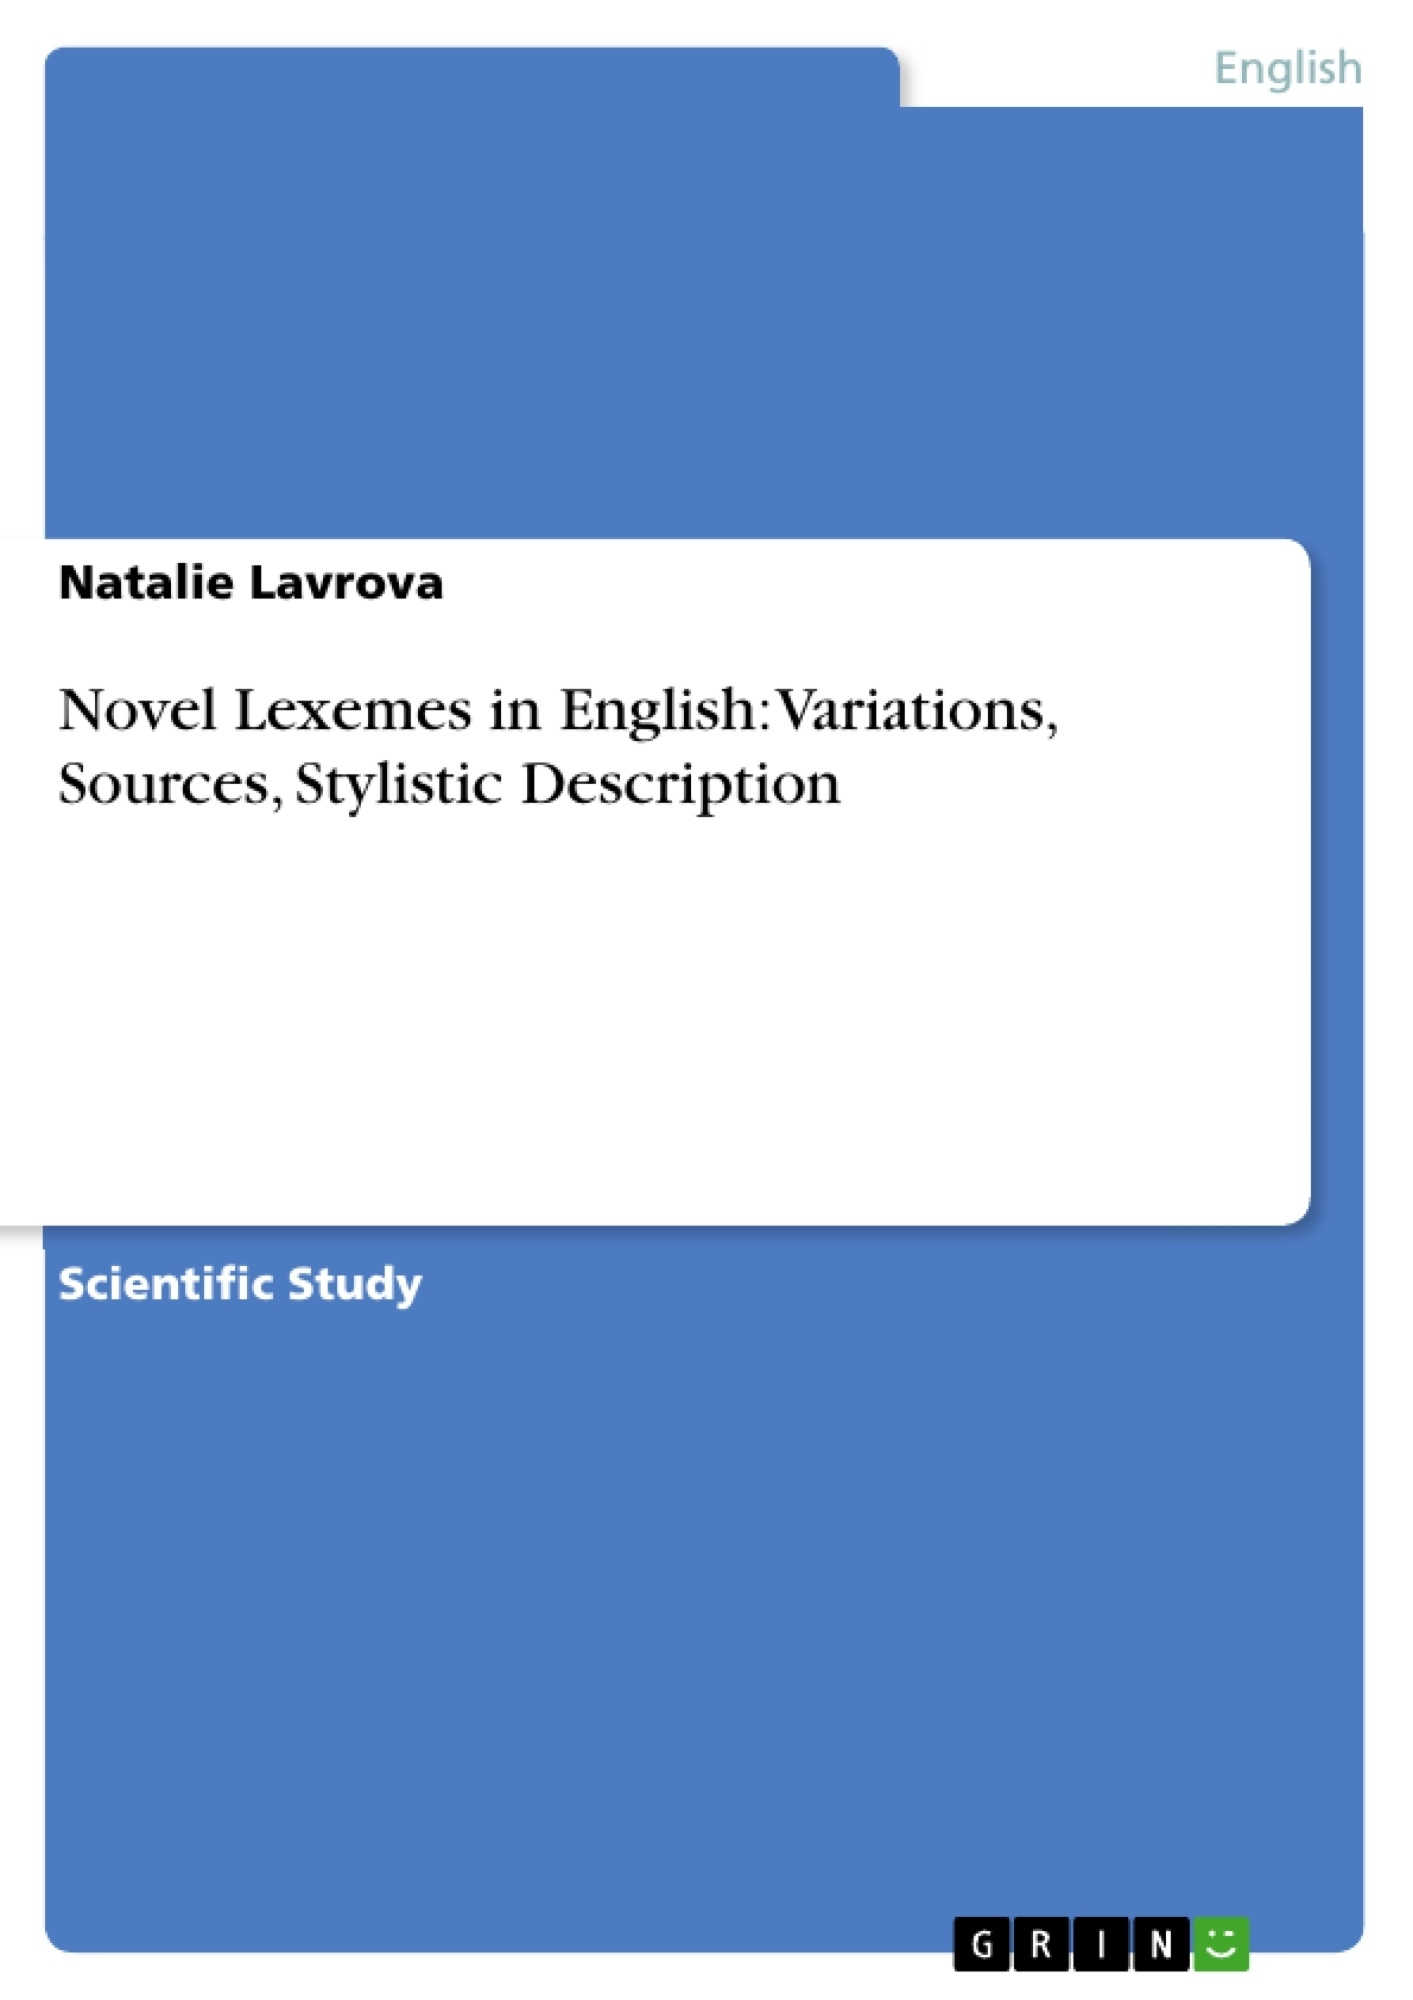 Title: Novel Lexemes in English: Variations, Sources, Stylistic Description